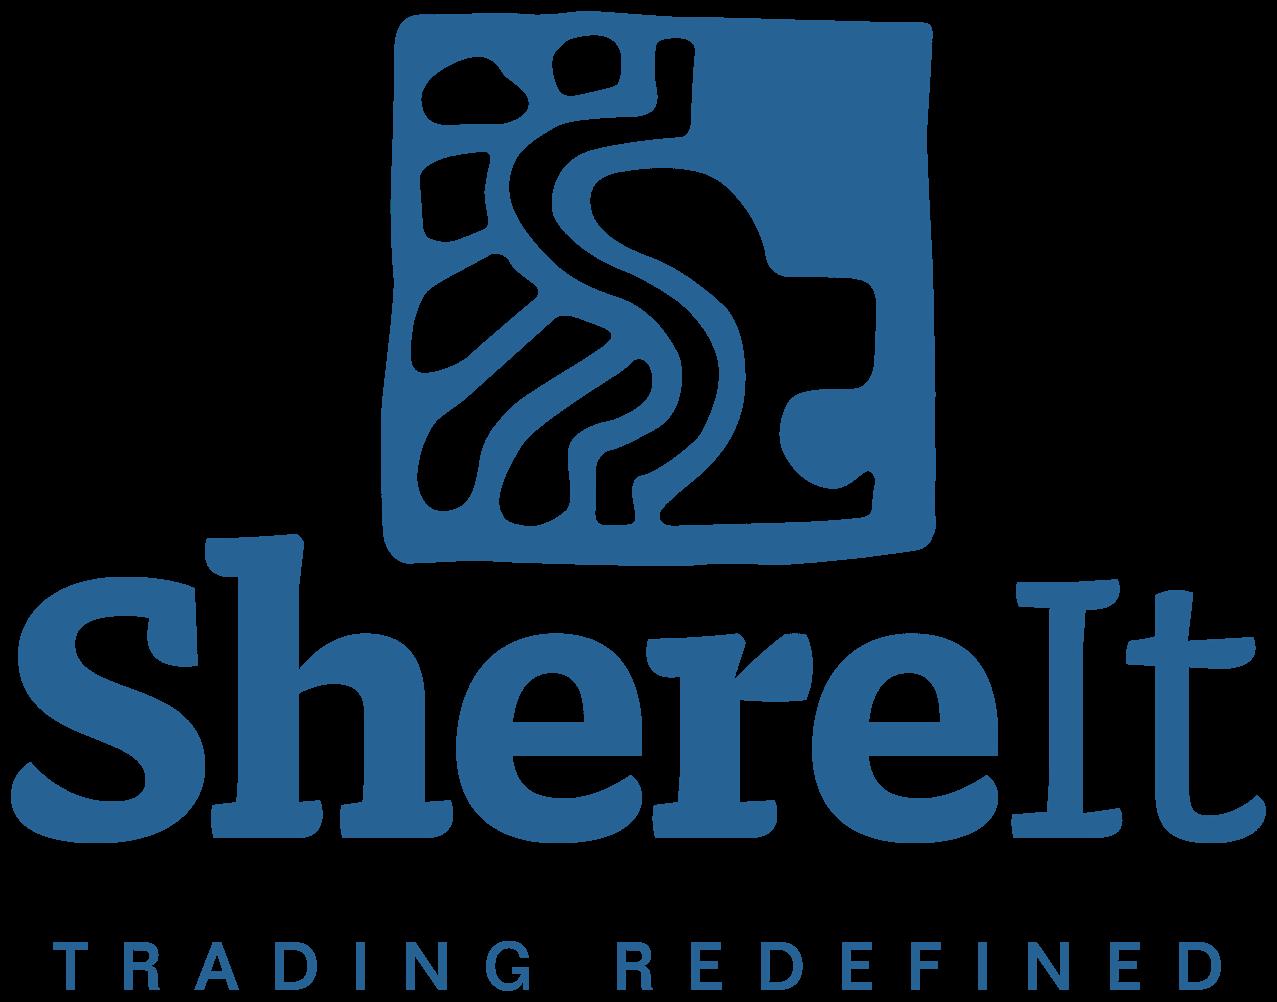 sherelt